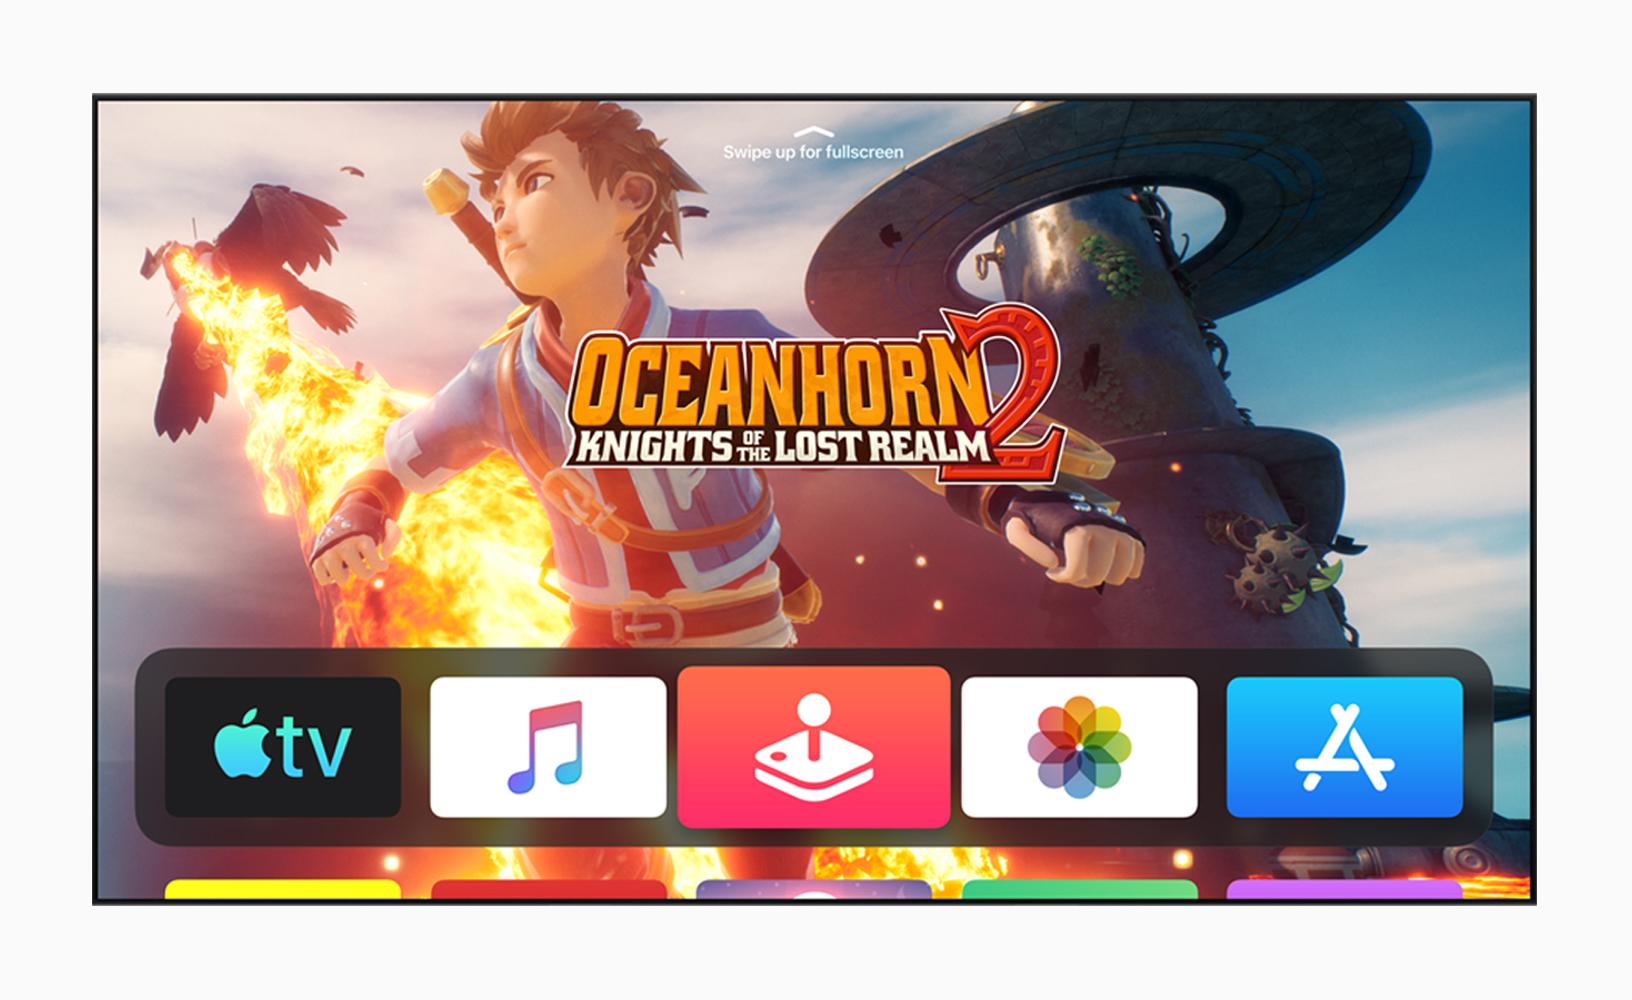 A screenshot of Oceanhorn on tvOS13